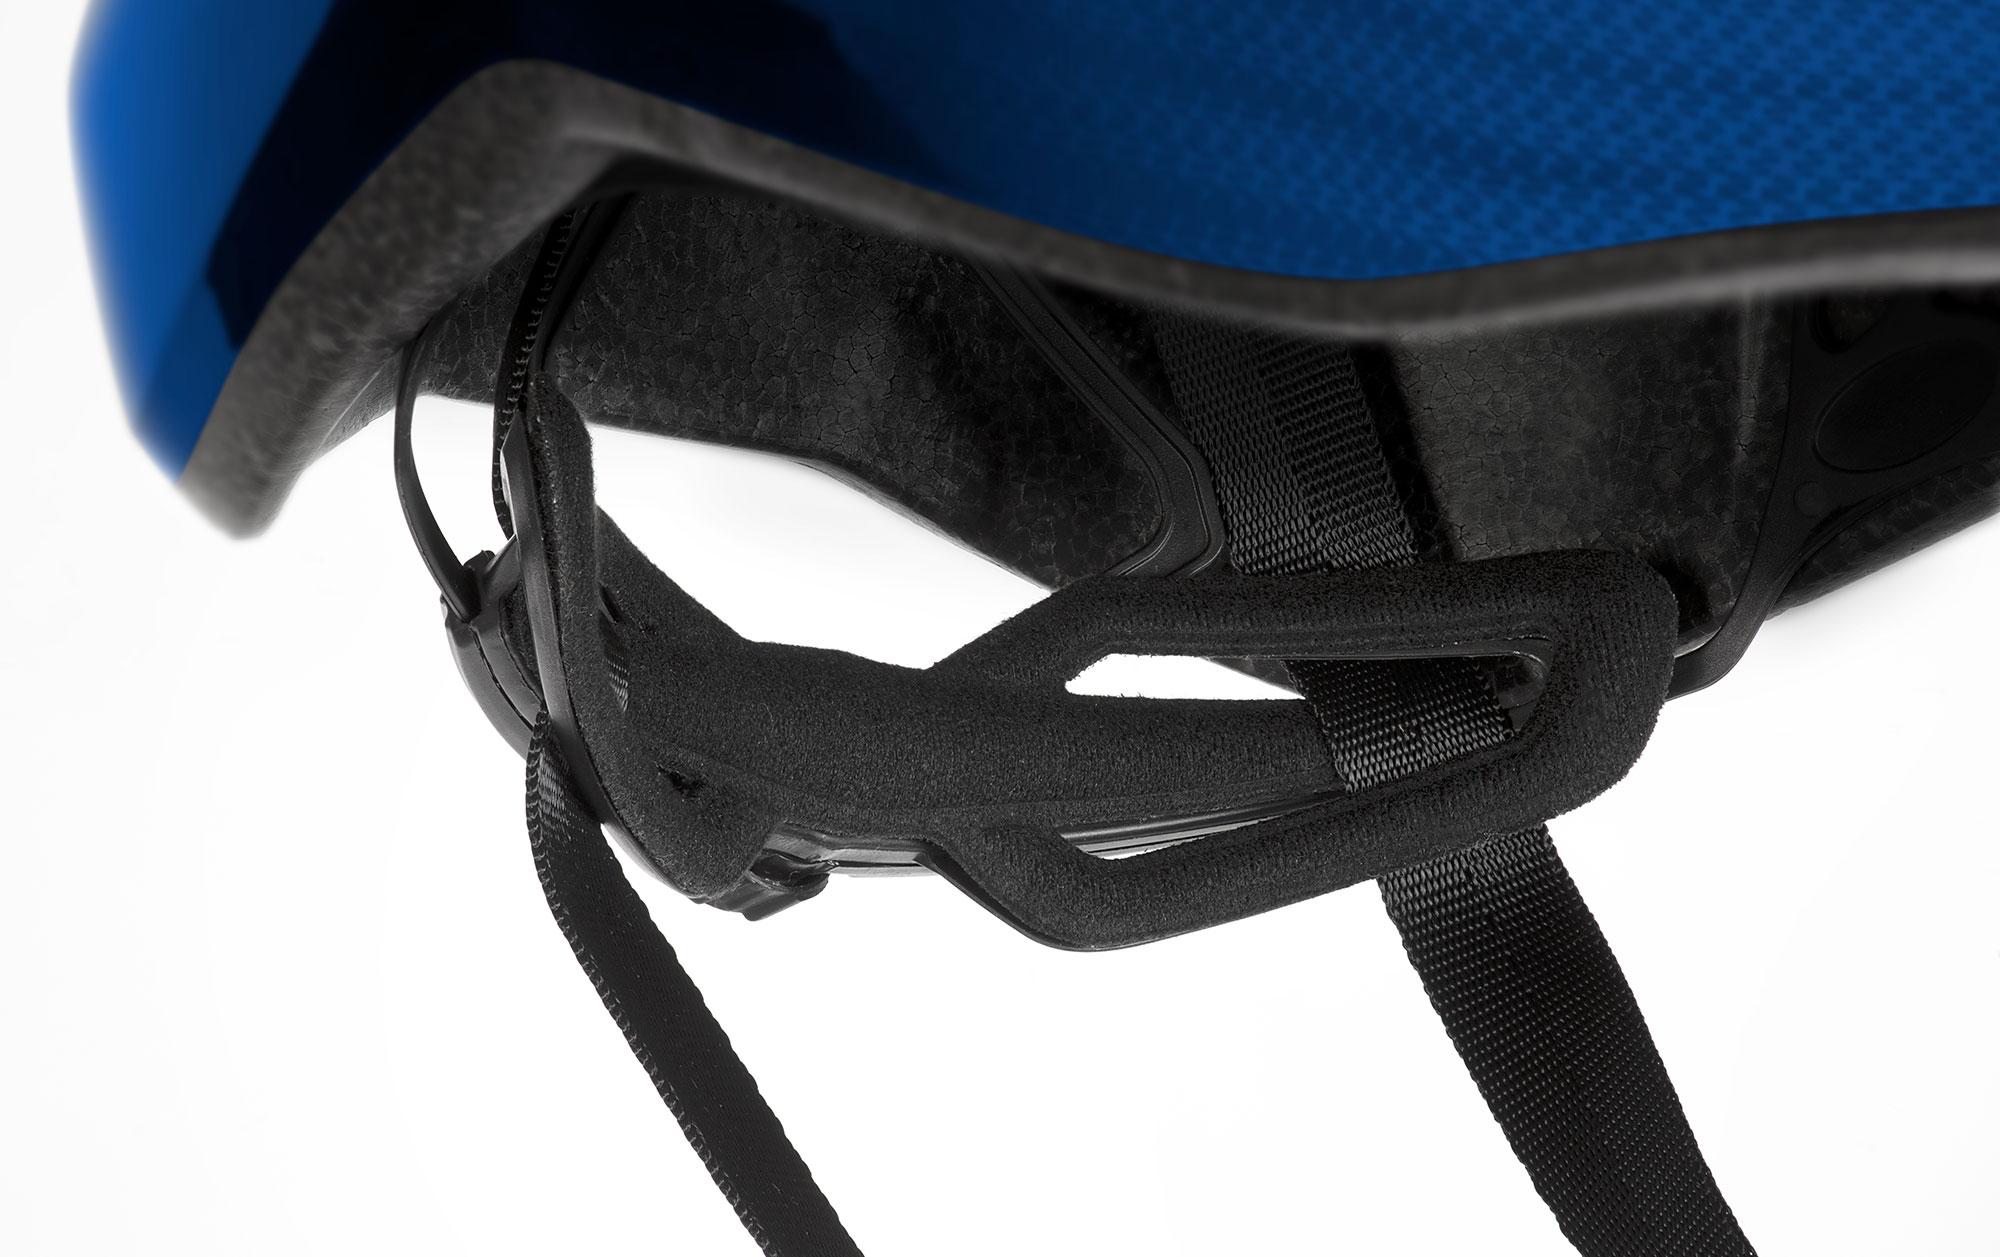 vinci-mips-cycling-helmet-retention-system